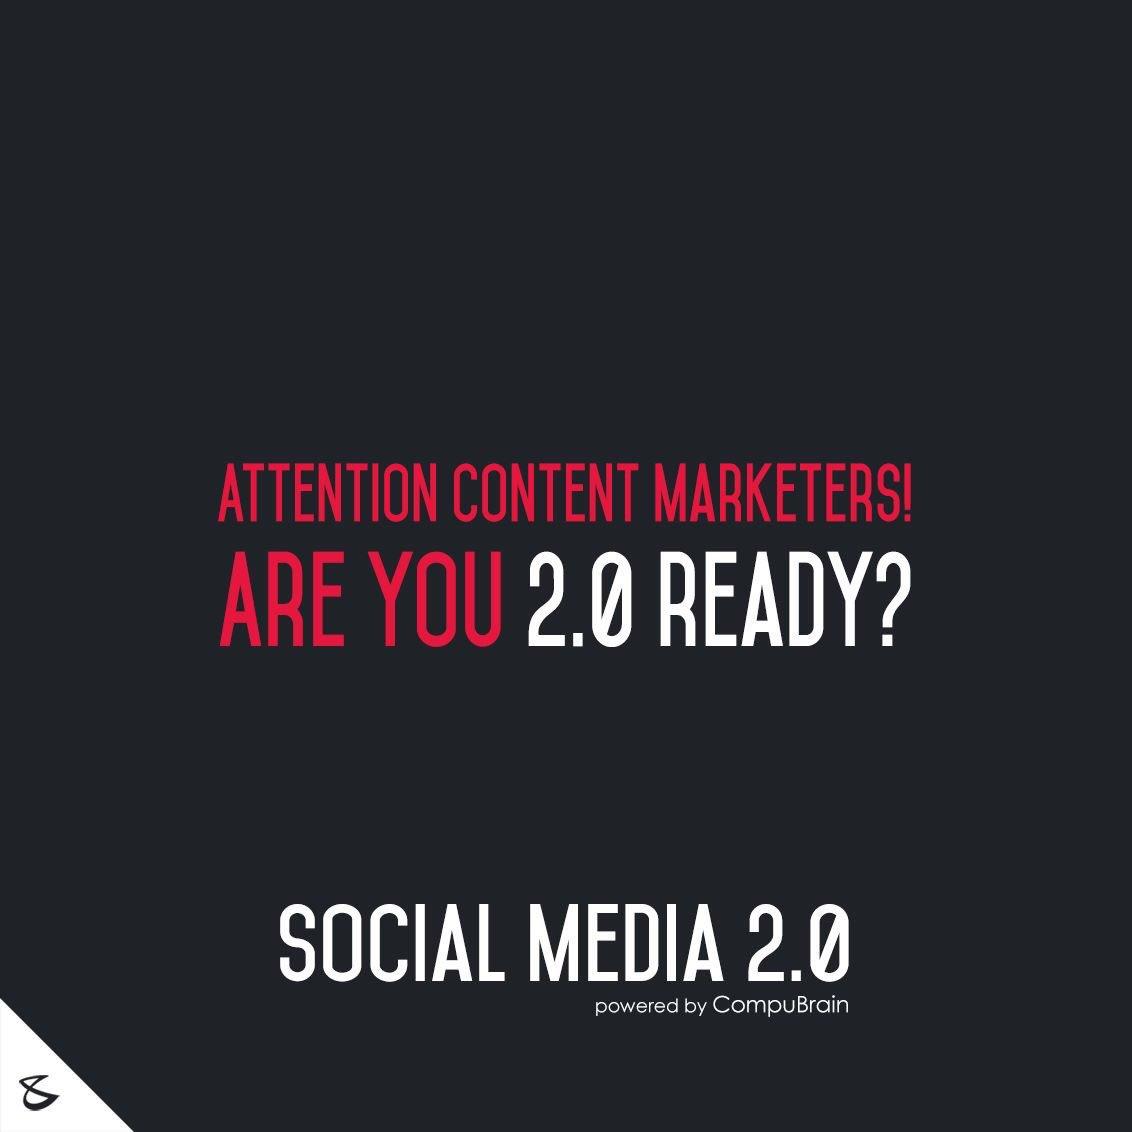 #ContentWriters #DigitalMarketing #SocialMedia2point0  #NextinSocialMedia #CompuBrain #SEO #SEM Know more on https://t.co/wjOMXbfL8A https://t.co/PxKLuqlVi1